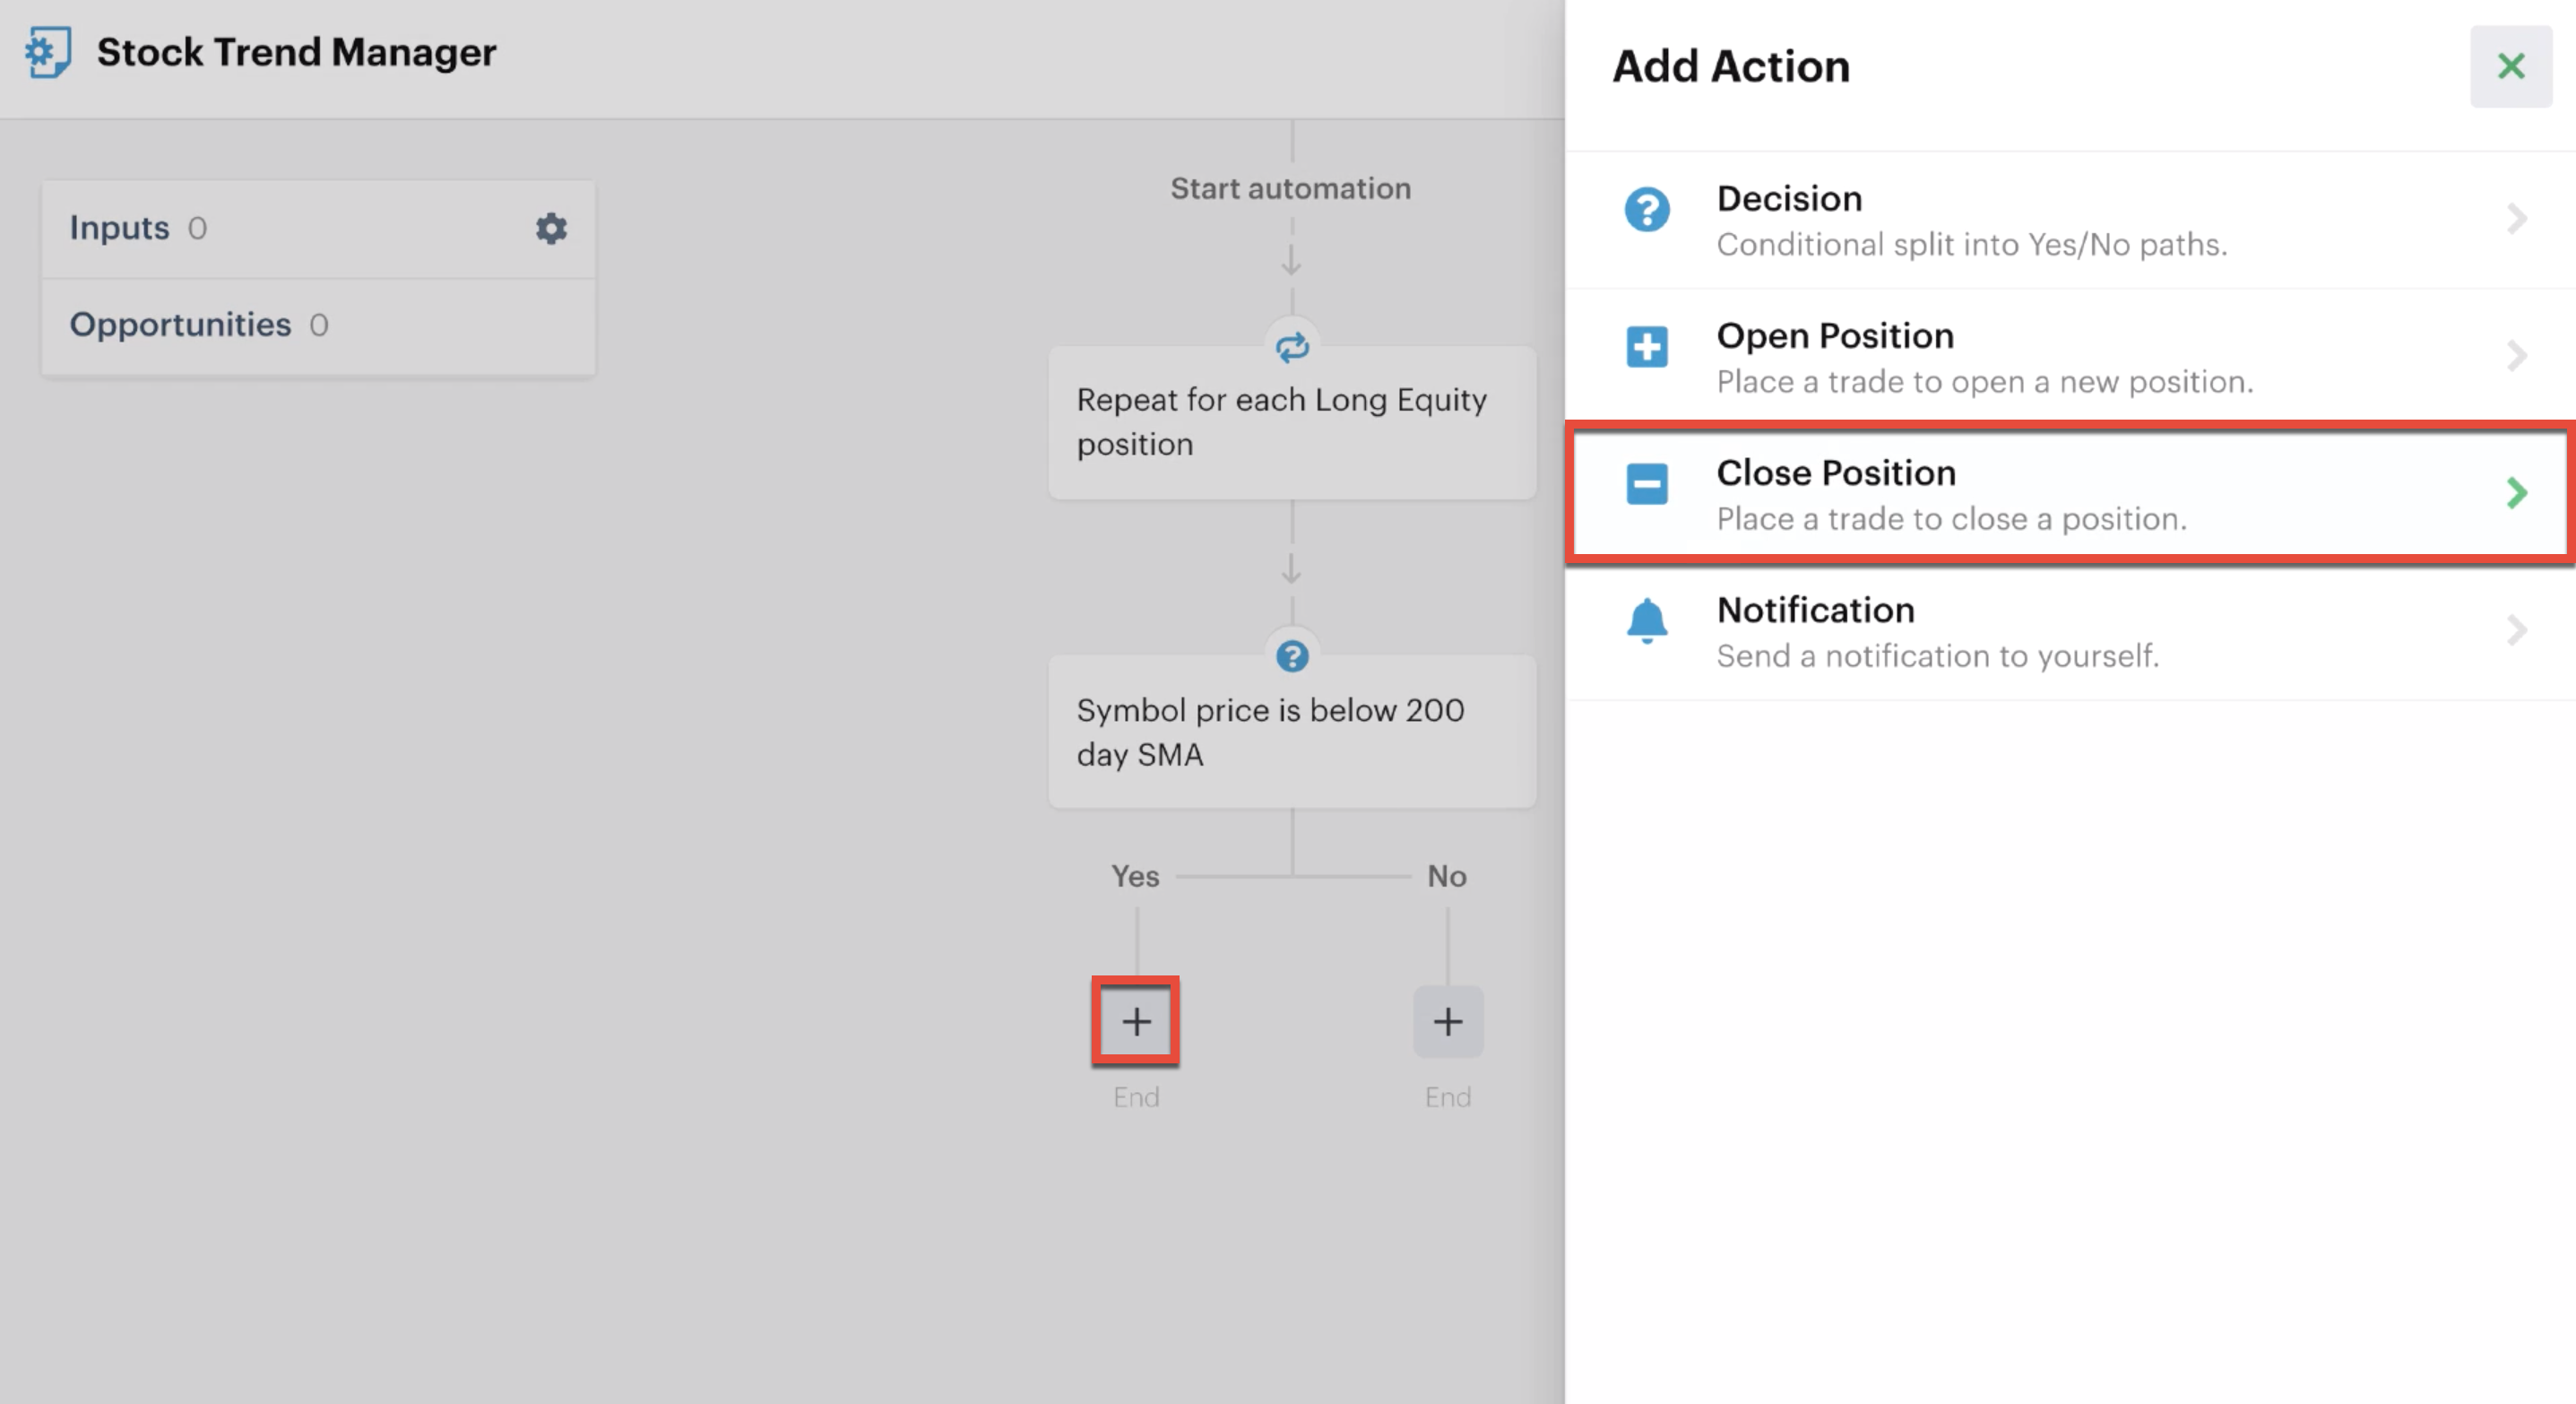 Adding a close position action